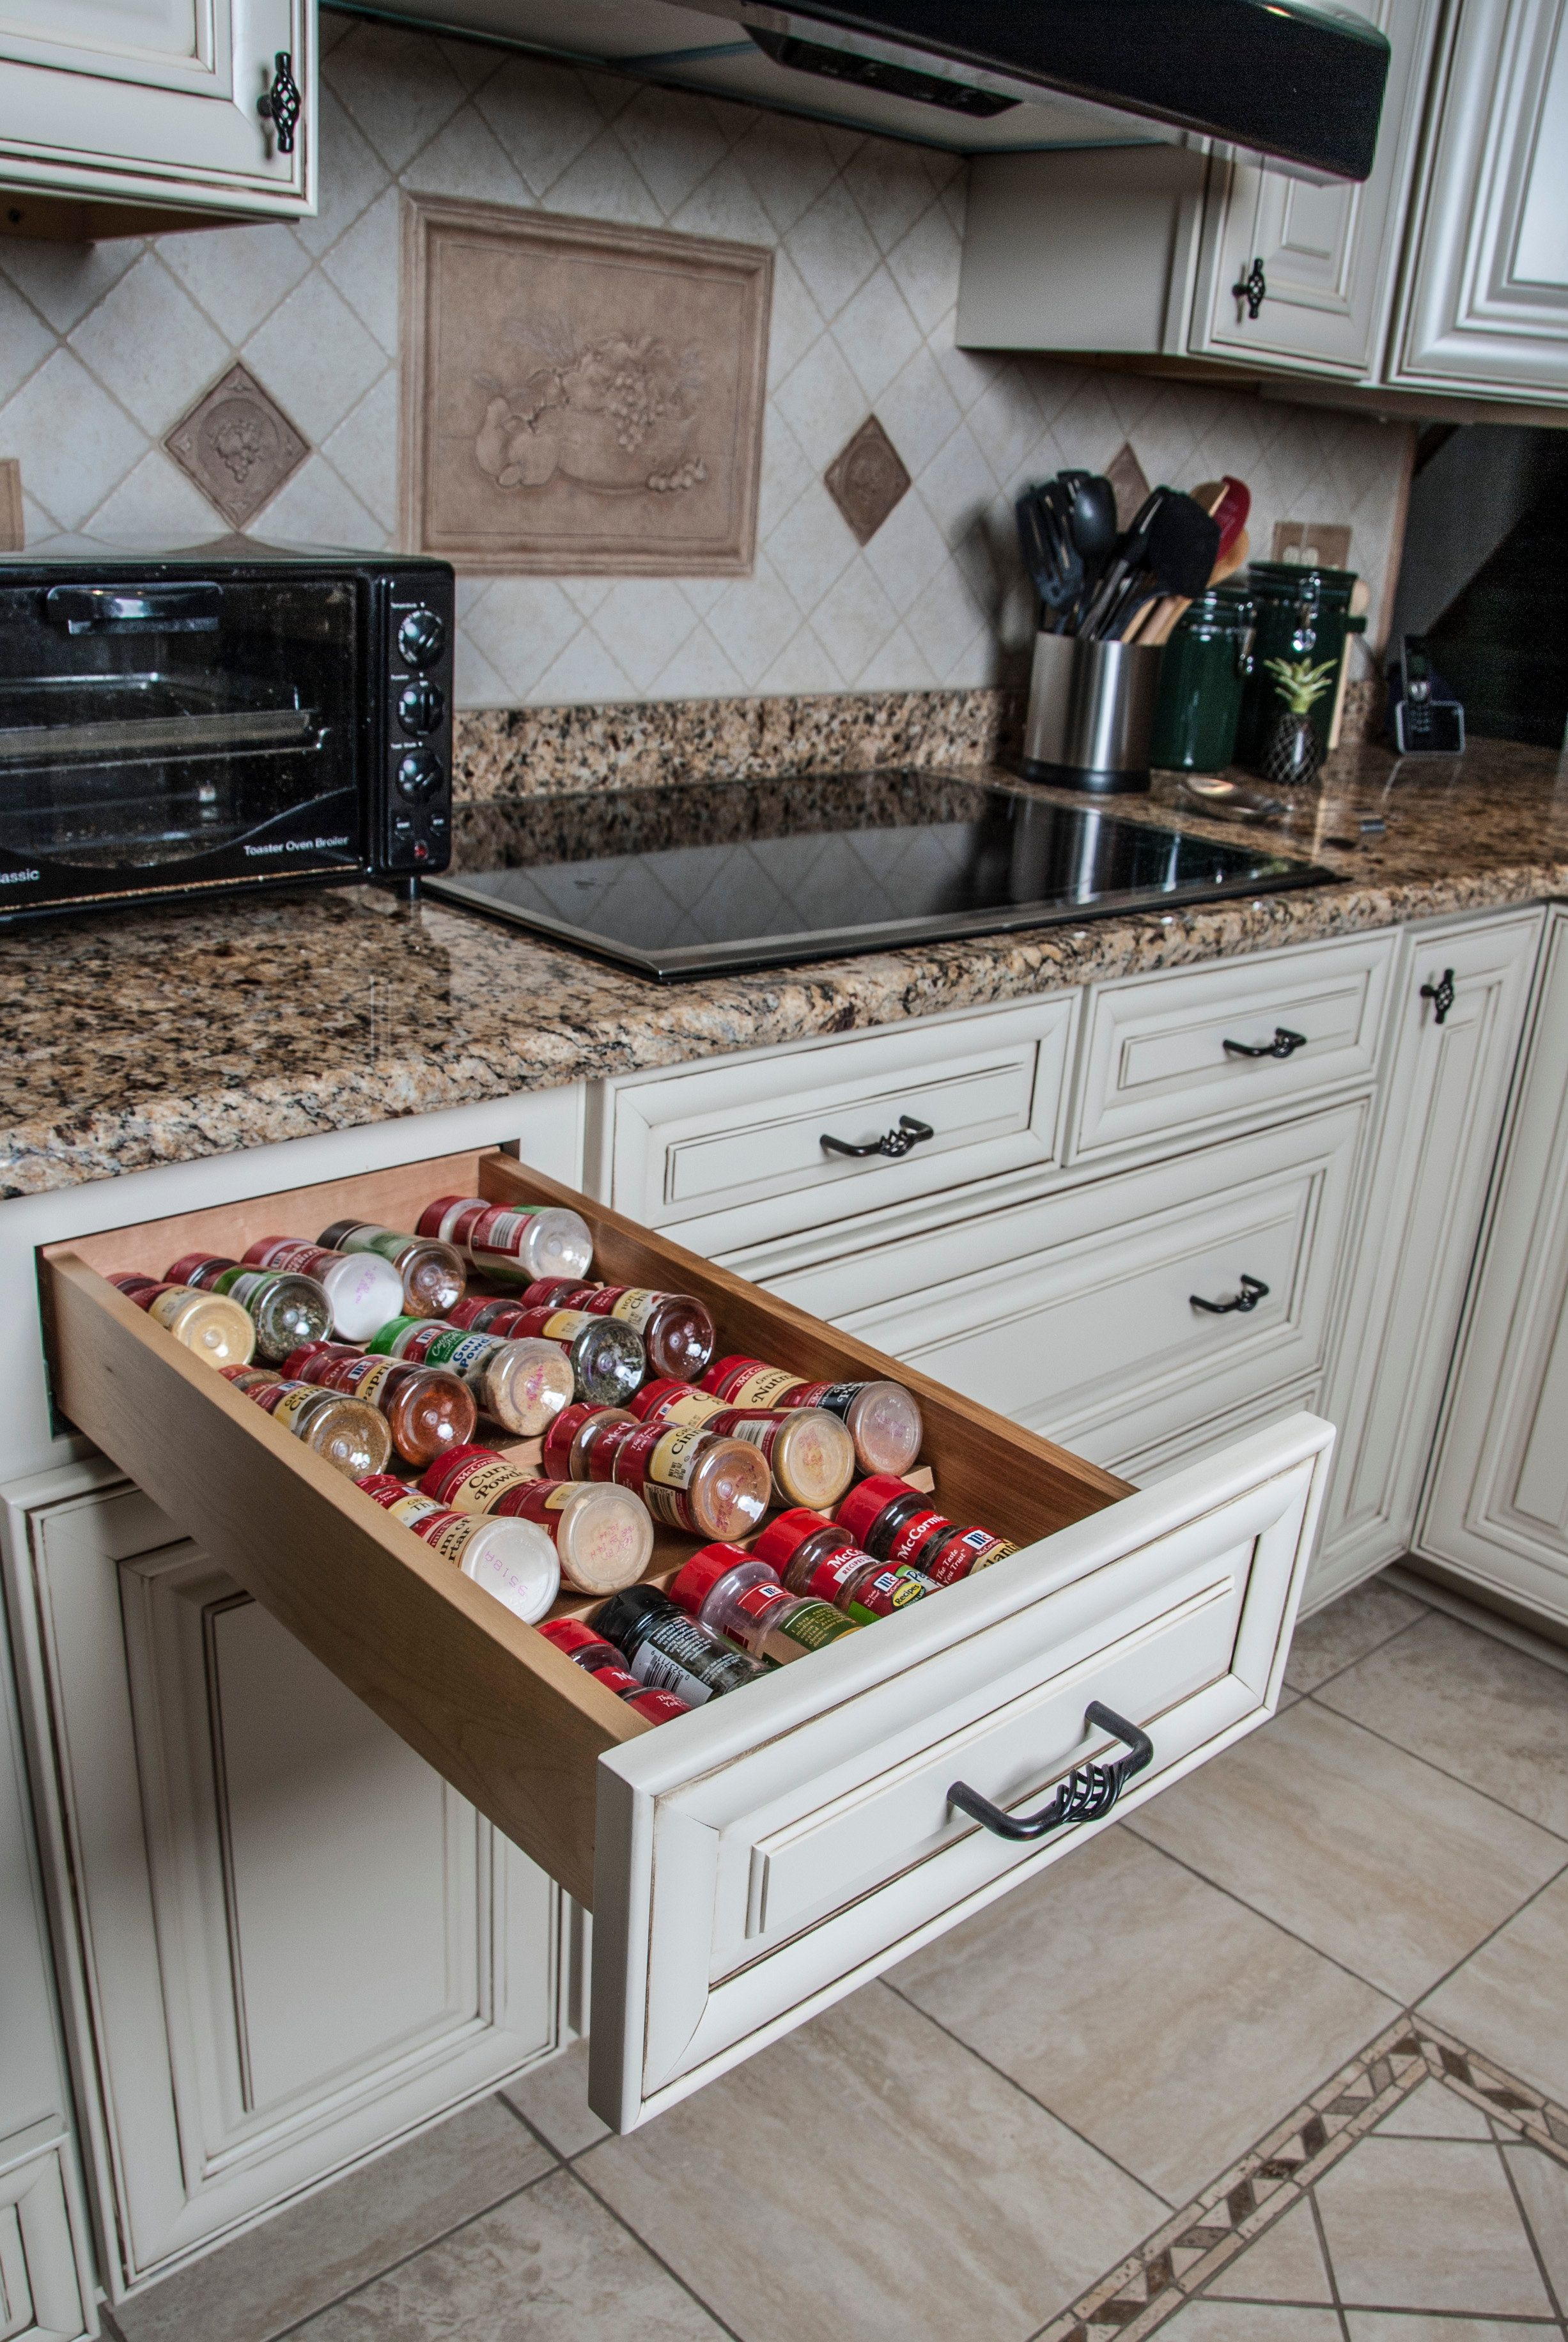 Off White Cabinets With Antique Glaze Birds Nest Hardware Oil Rubbed Bronze Hardware Drawers Under Cook Top Custom Kitchen Cabinets Kitchen Kitchen Design